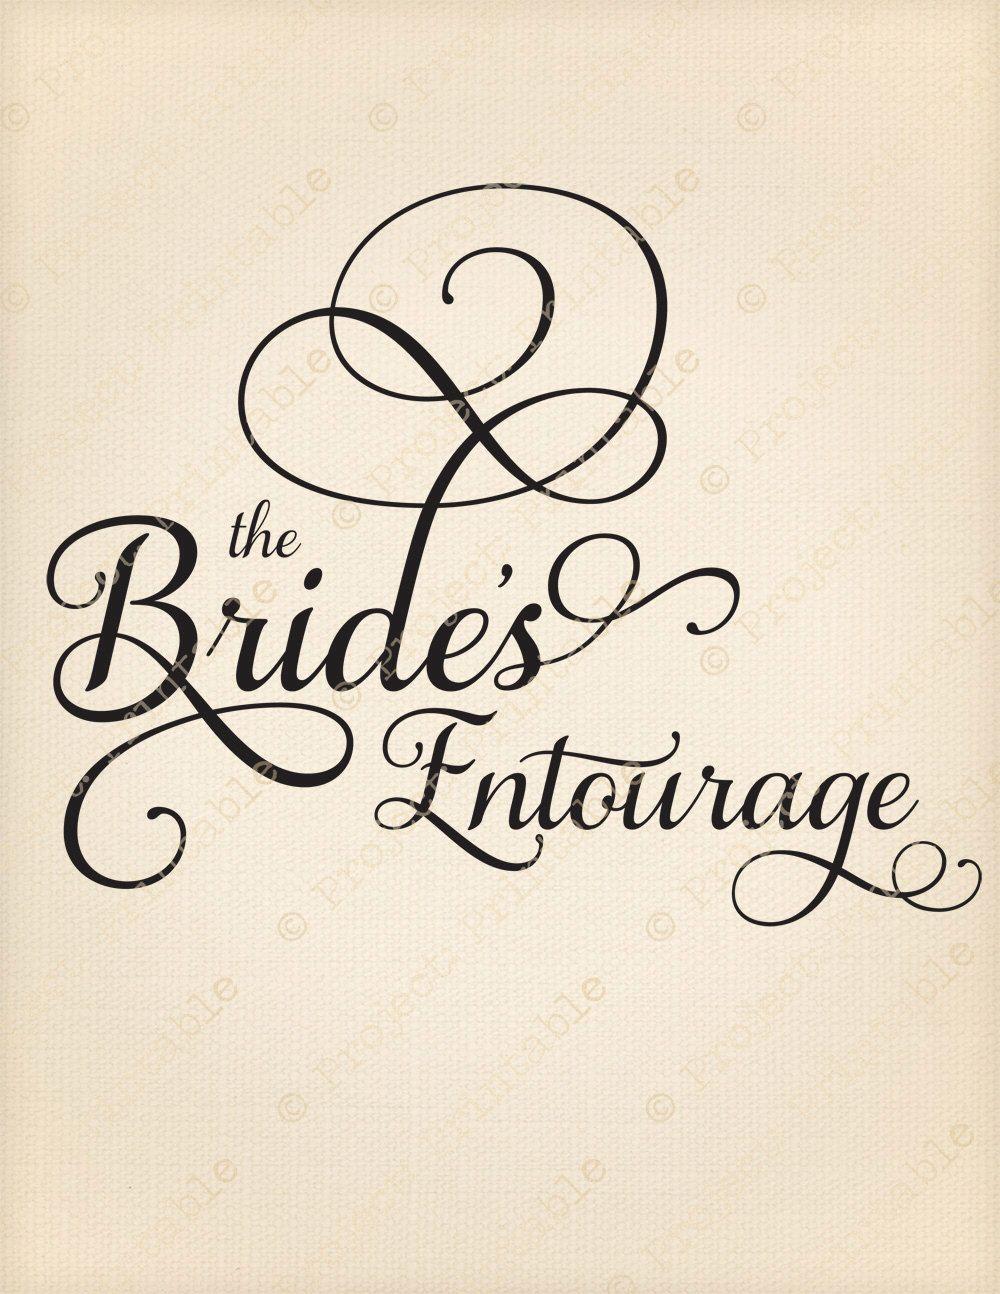 The Bride S Entourage Wedding Printable Sign Label Instant Fabric Image Transfer Iron